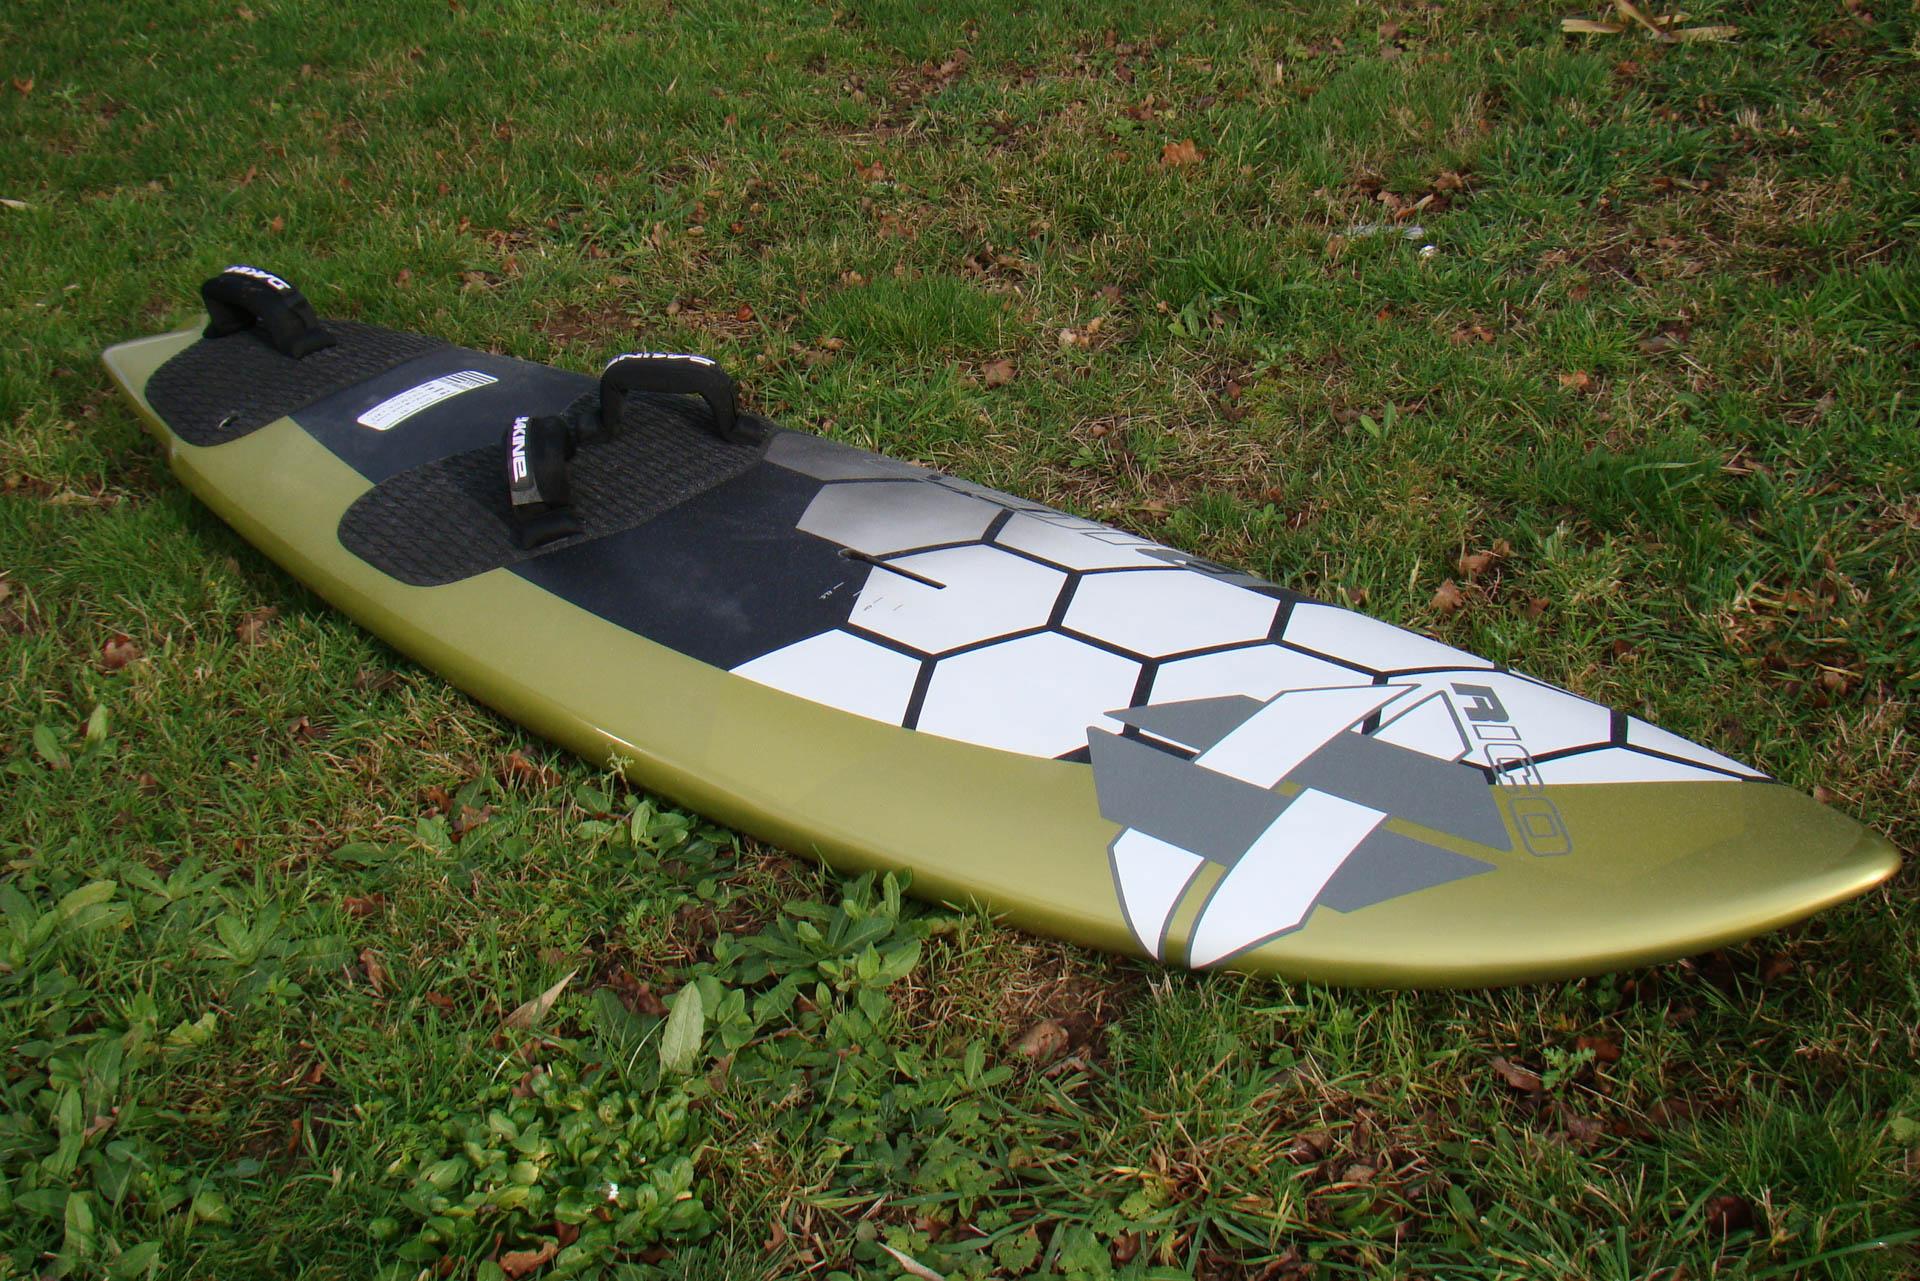 Rico custom windsurf wingers82, 223x56.4cm